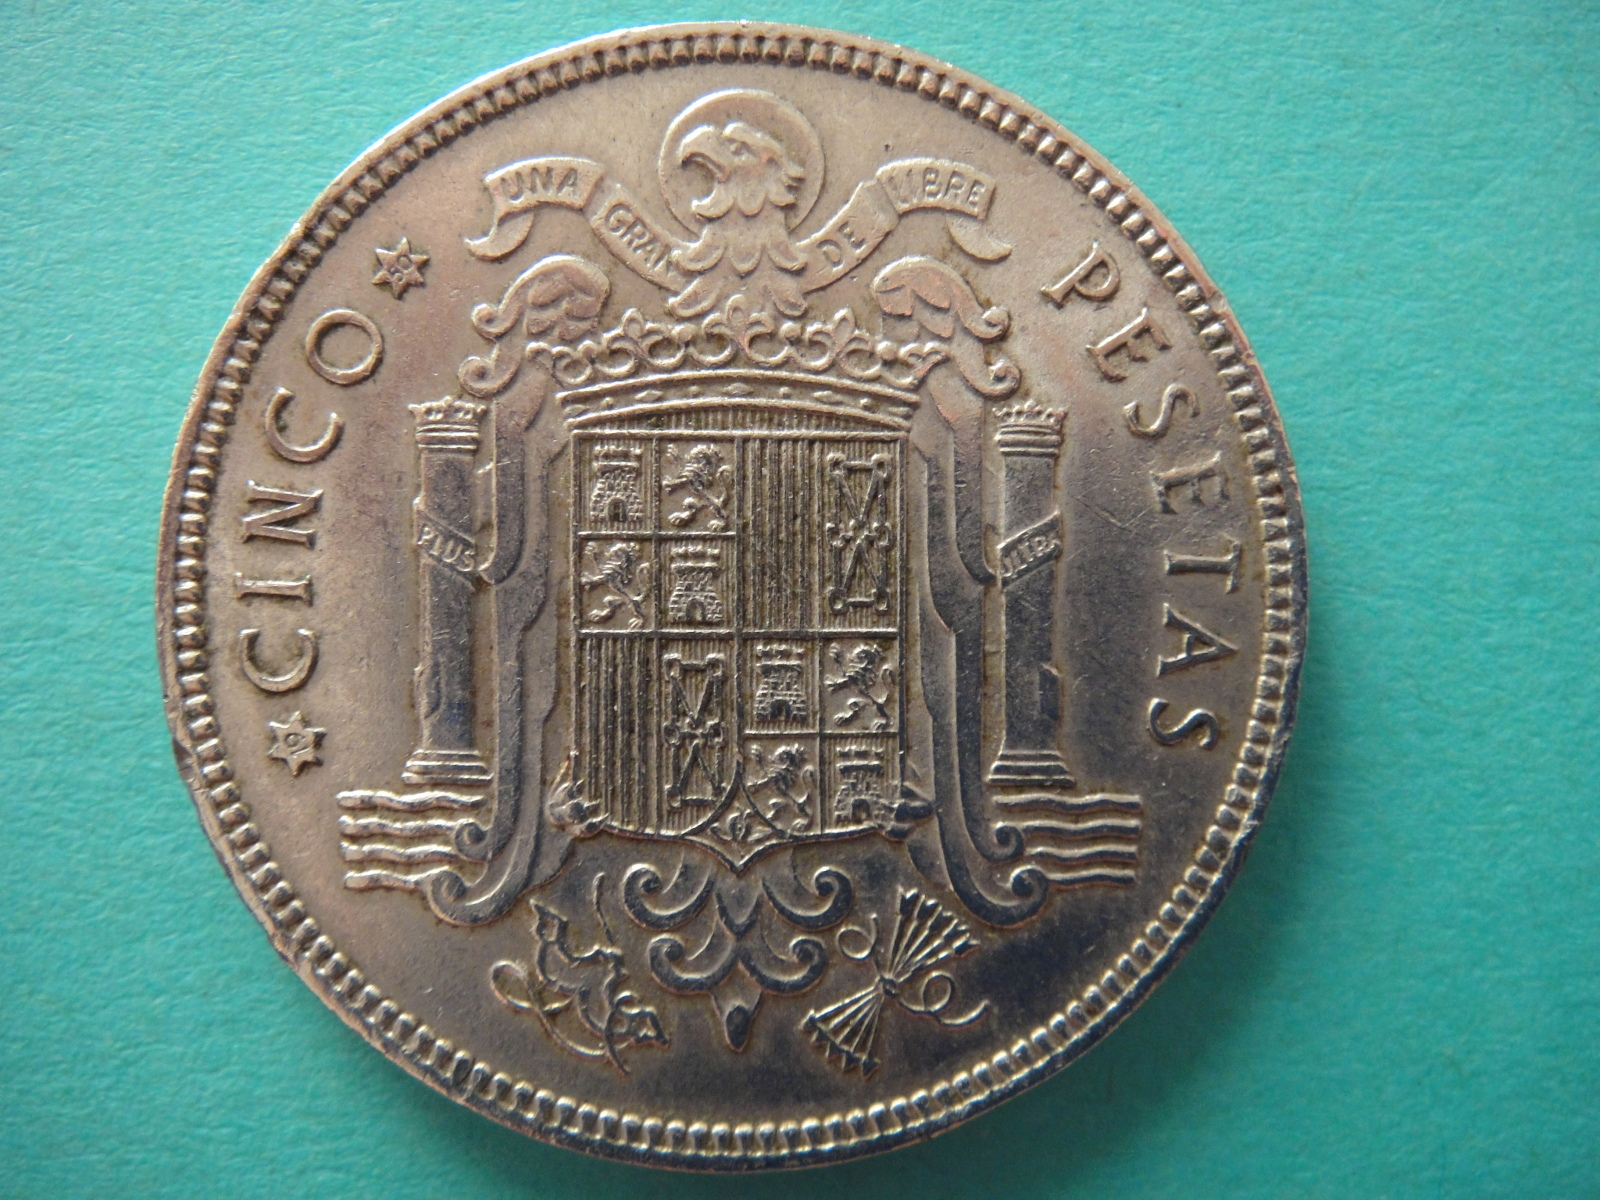 5 pesetas 1949 (*19-50). Estado Español Aey4xd